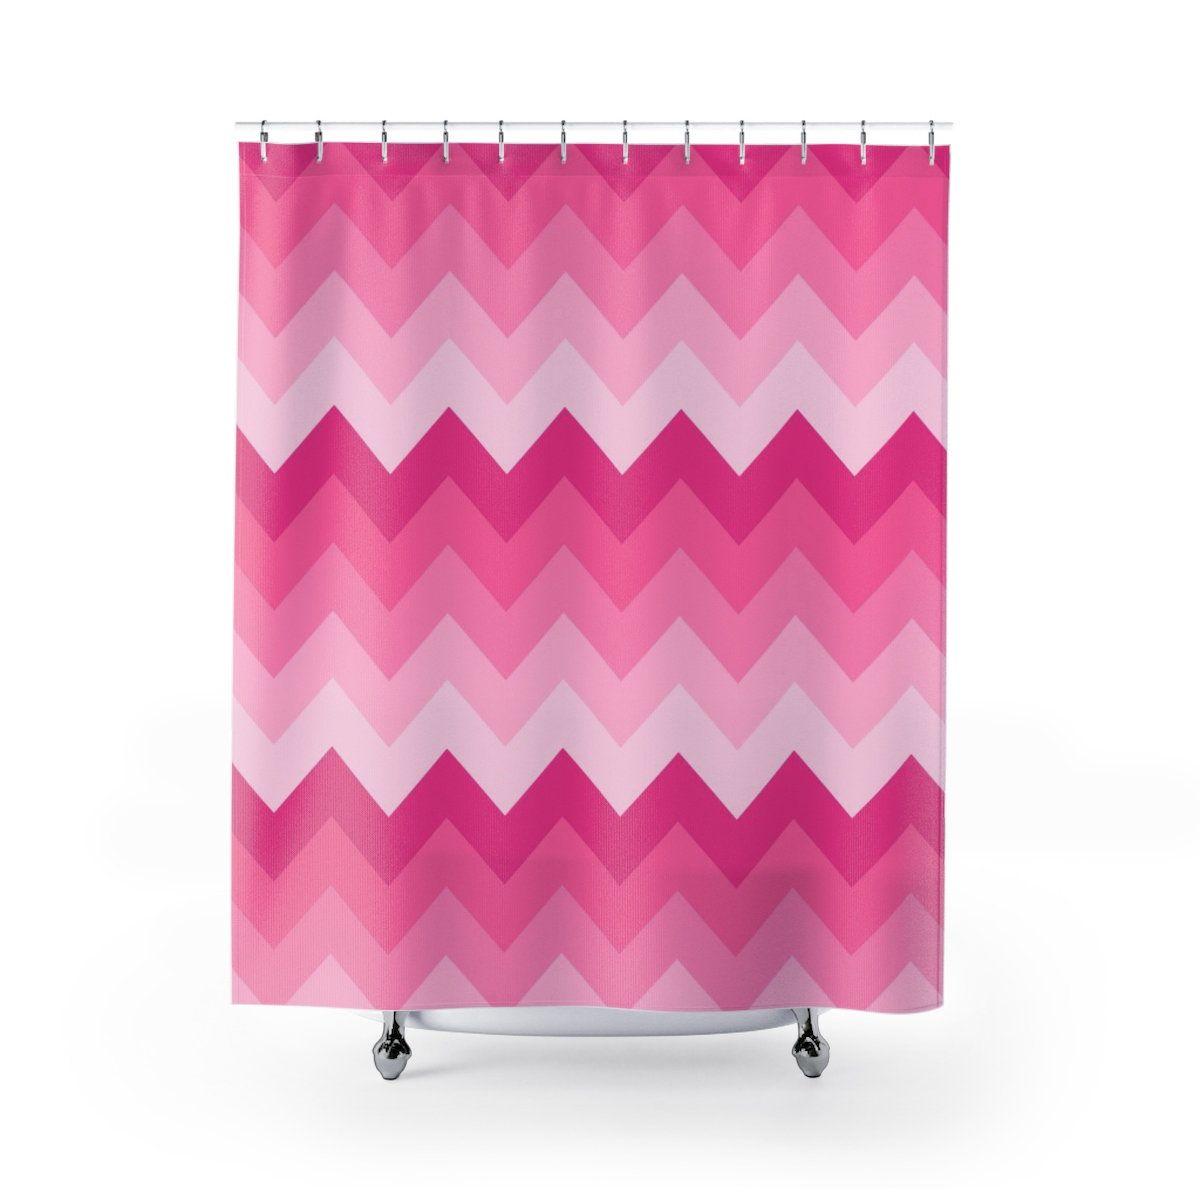 Hot Pink Chevron Shower Curtain Girls Bathroom Bath Tub Room Decor